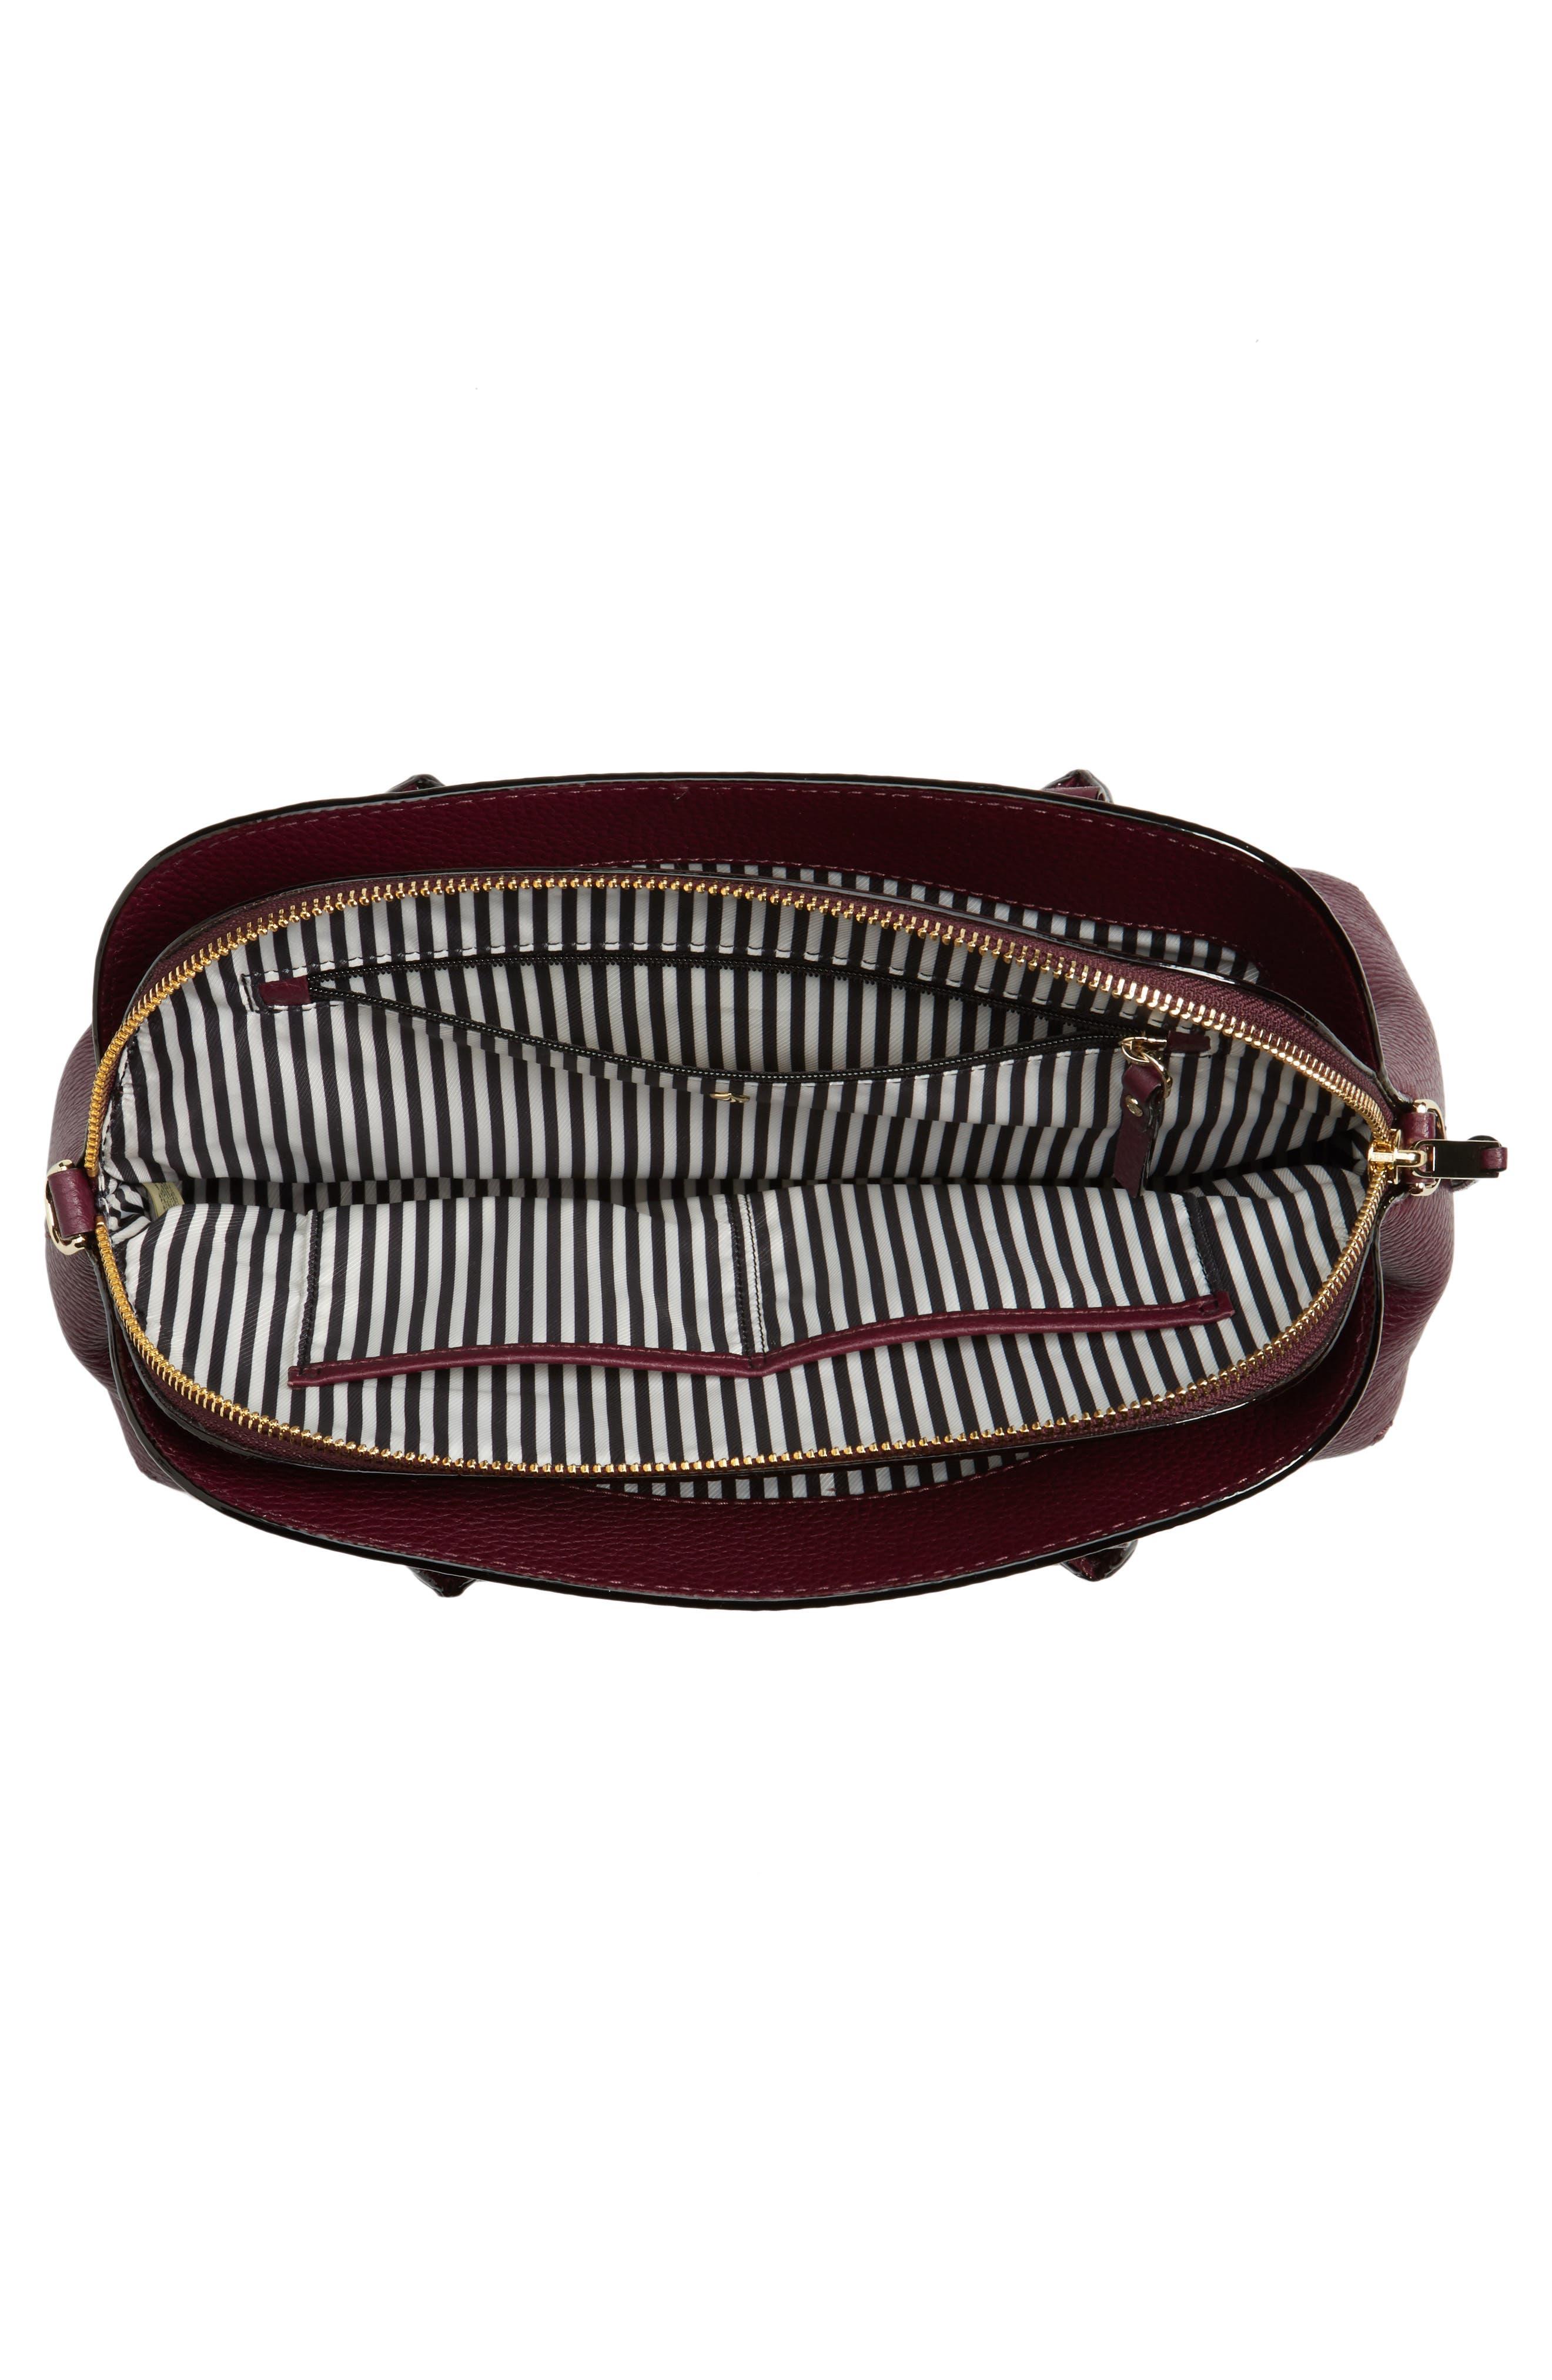 jackson street lottie leather satchel,                             Alternate thumbnail 12, color,